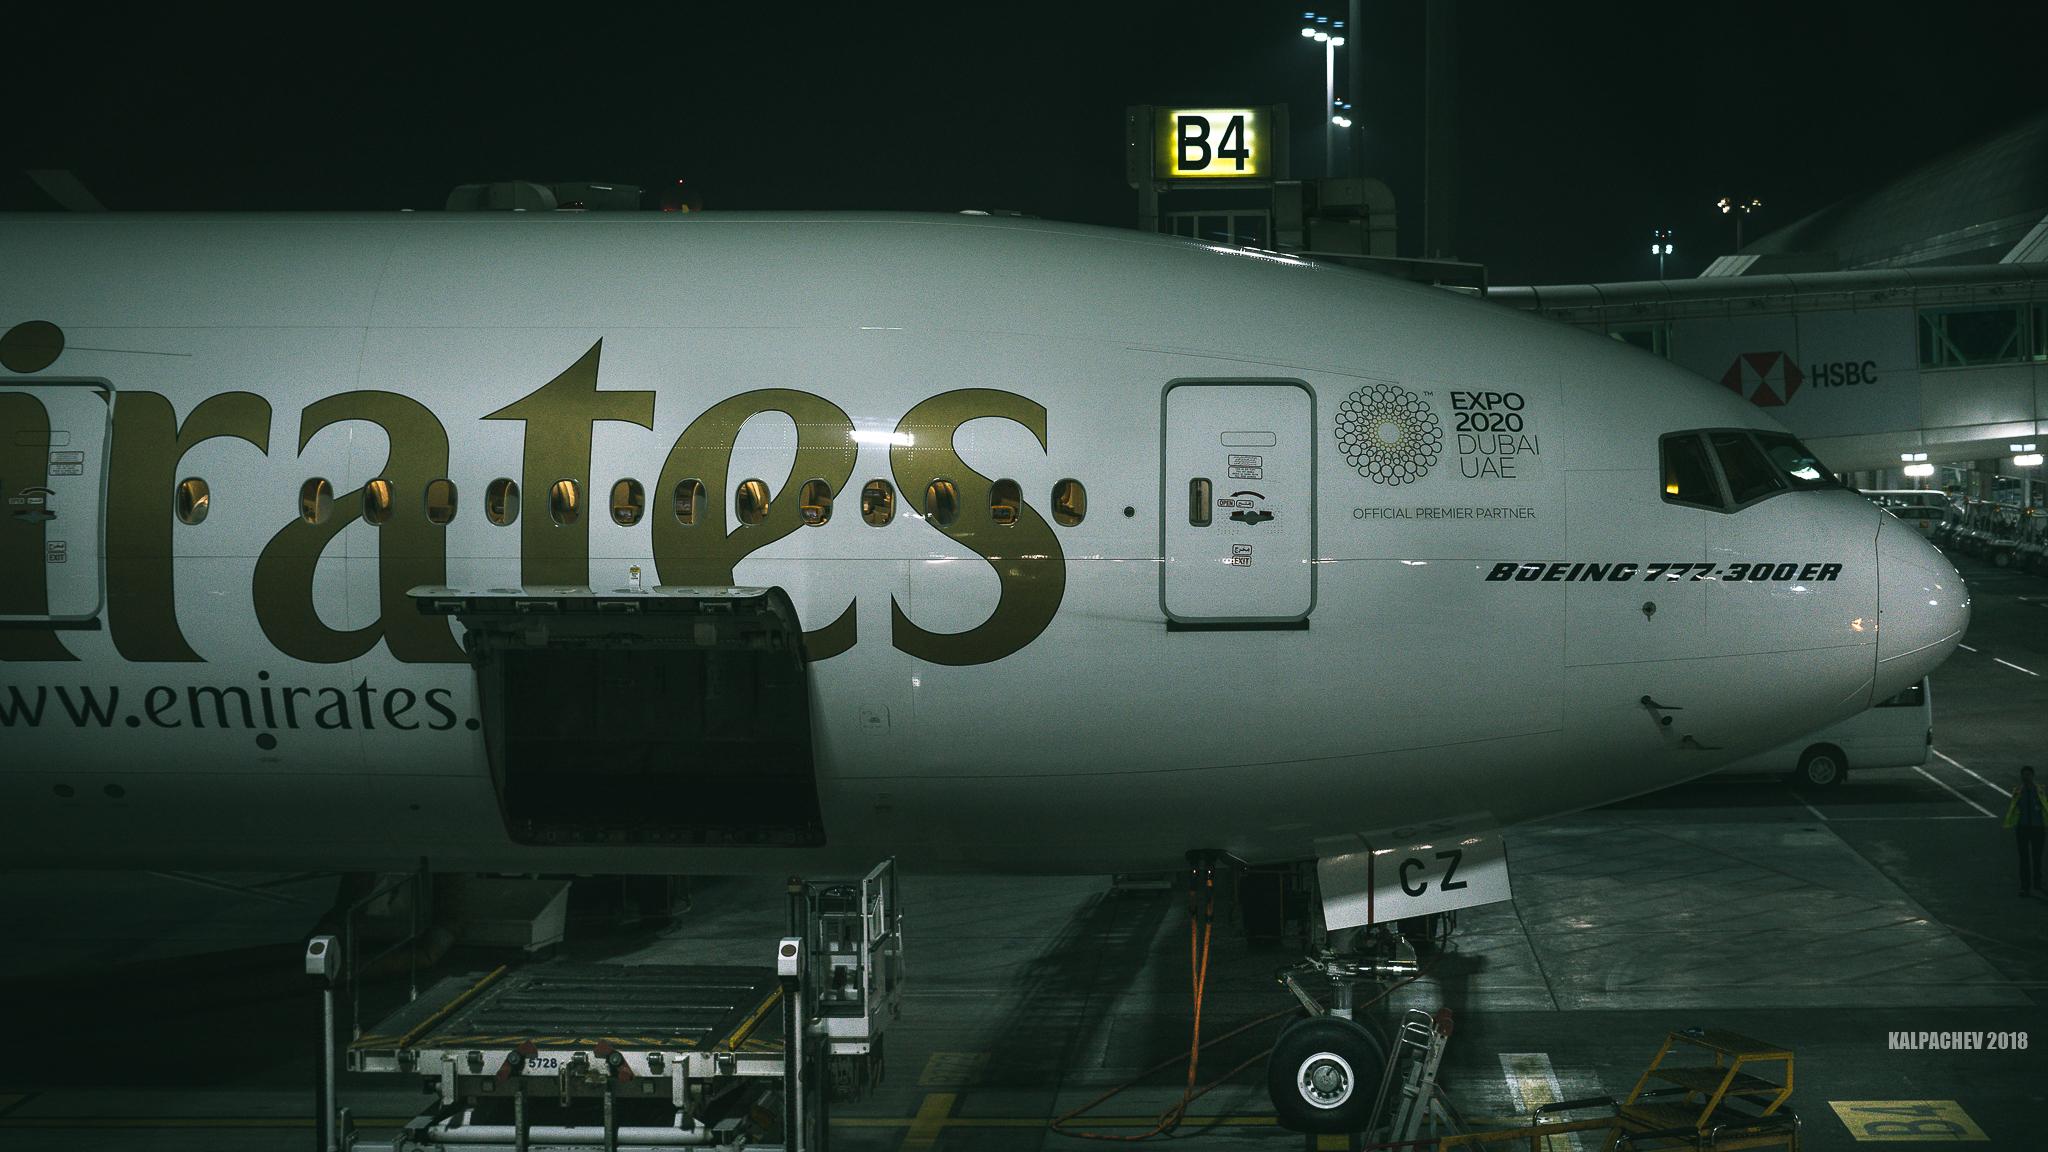 Boeing 777 at Dubai airport